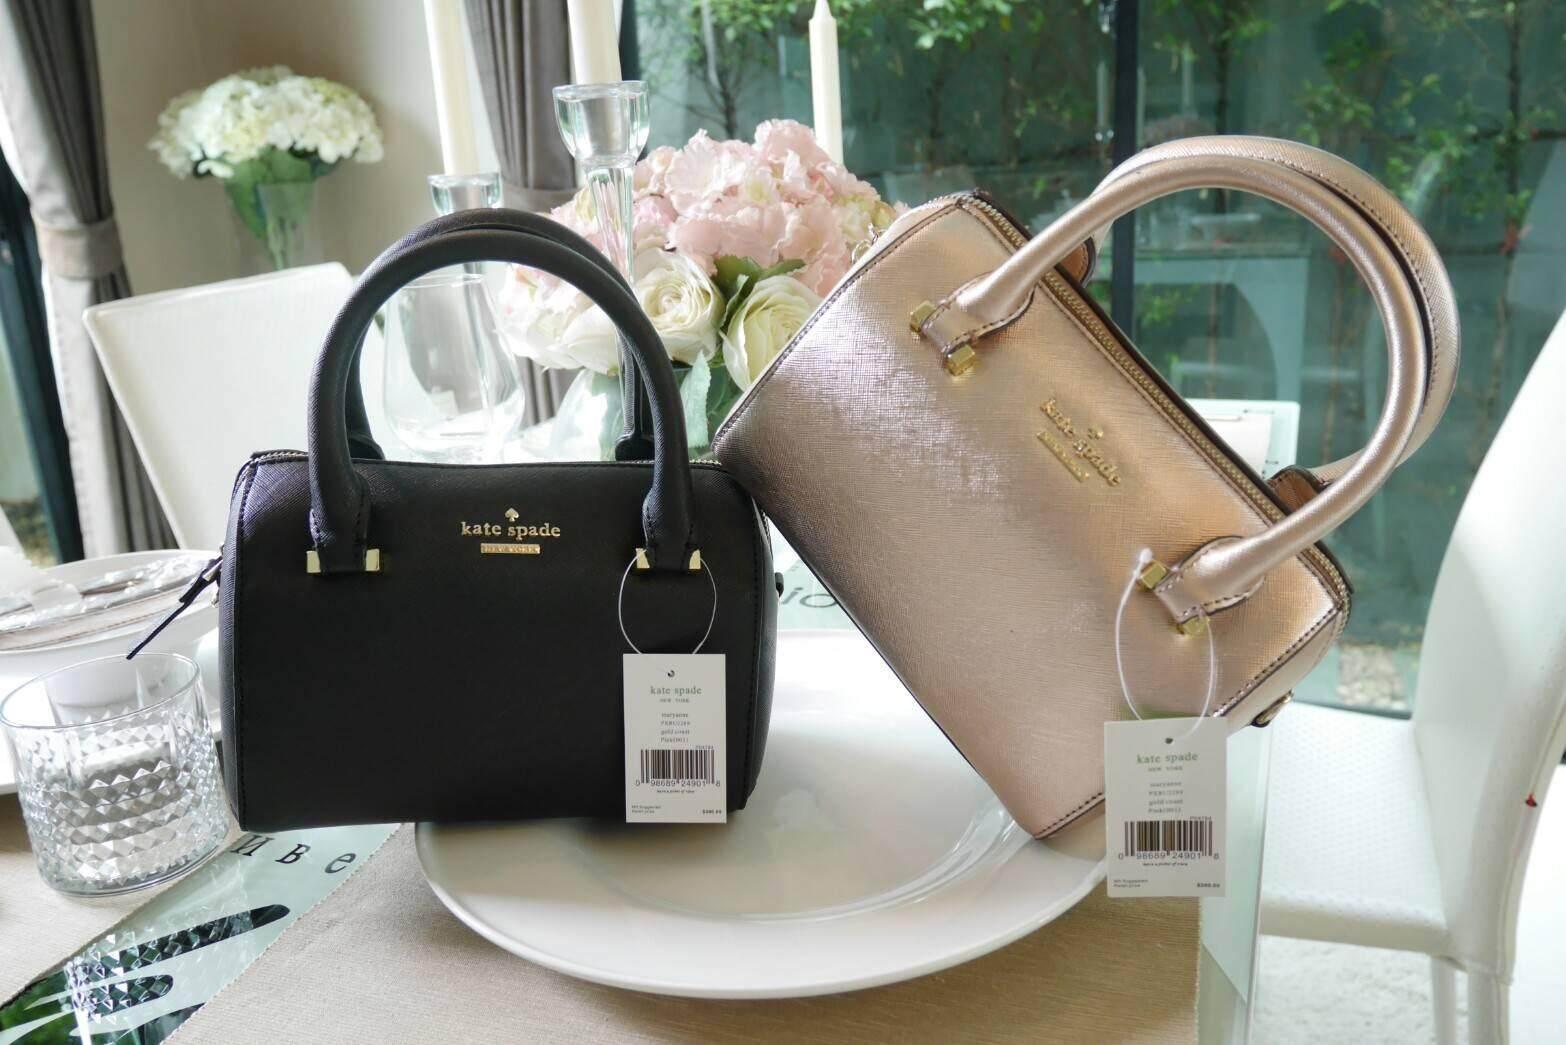 New!! Kate Spade crossbody bag